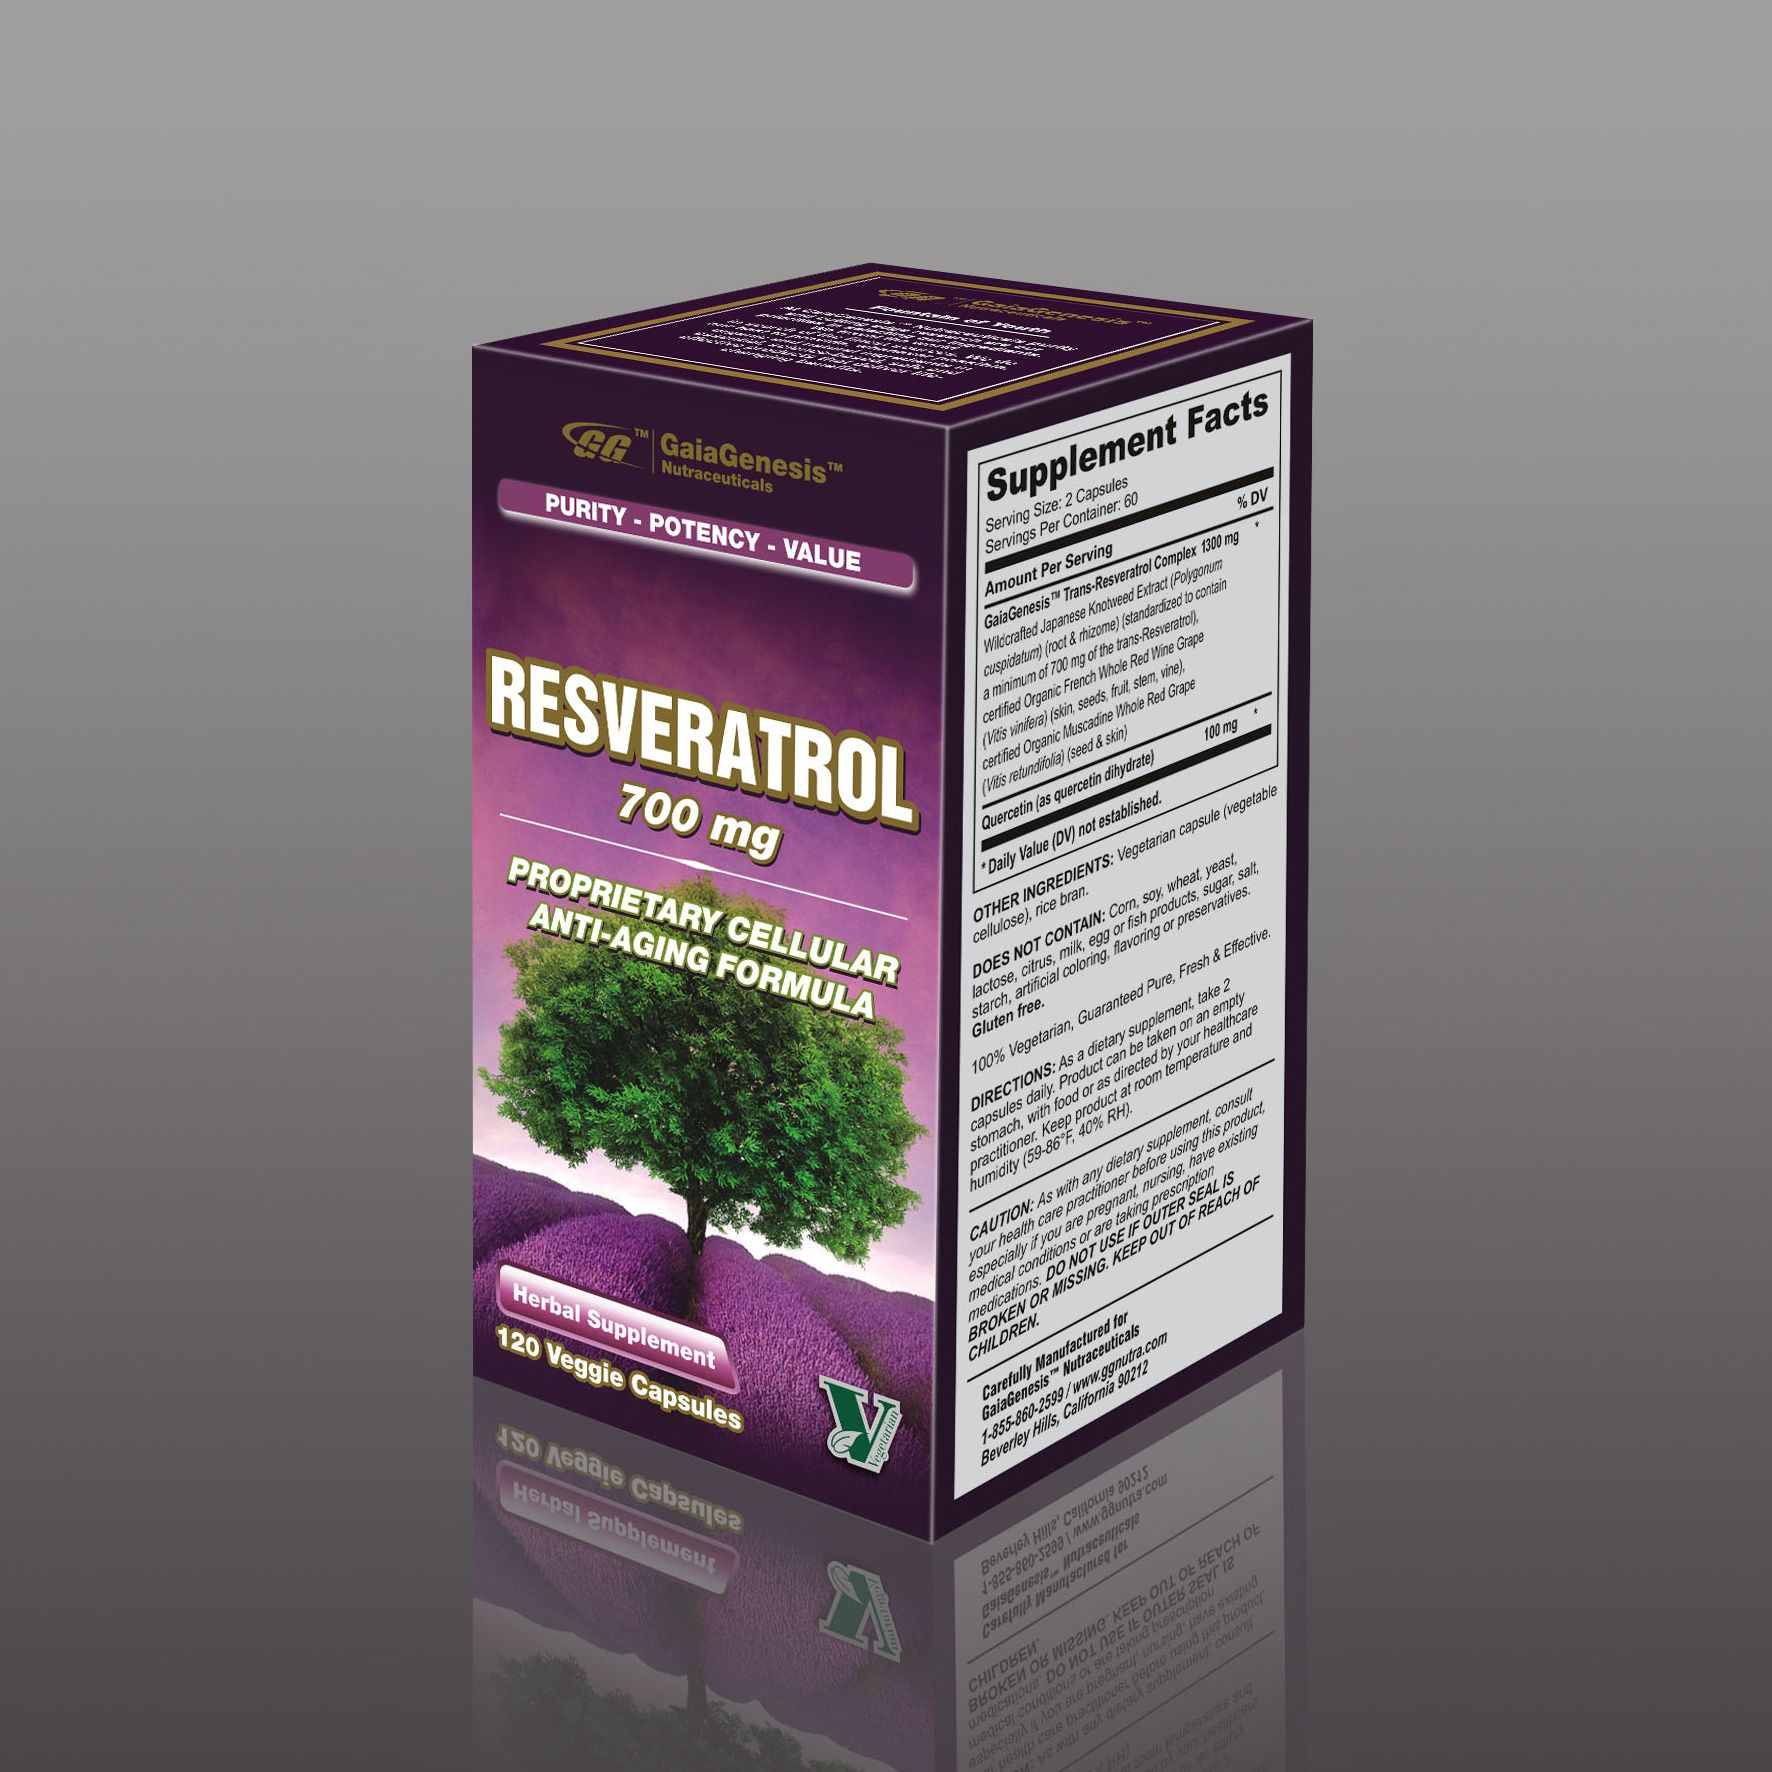 Pin by GaiaGenesis™ Nutraceuticals on GaiaGenesis